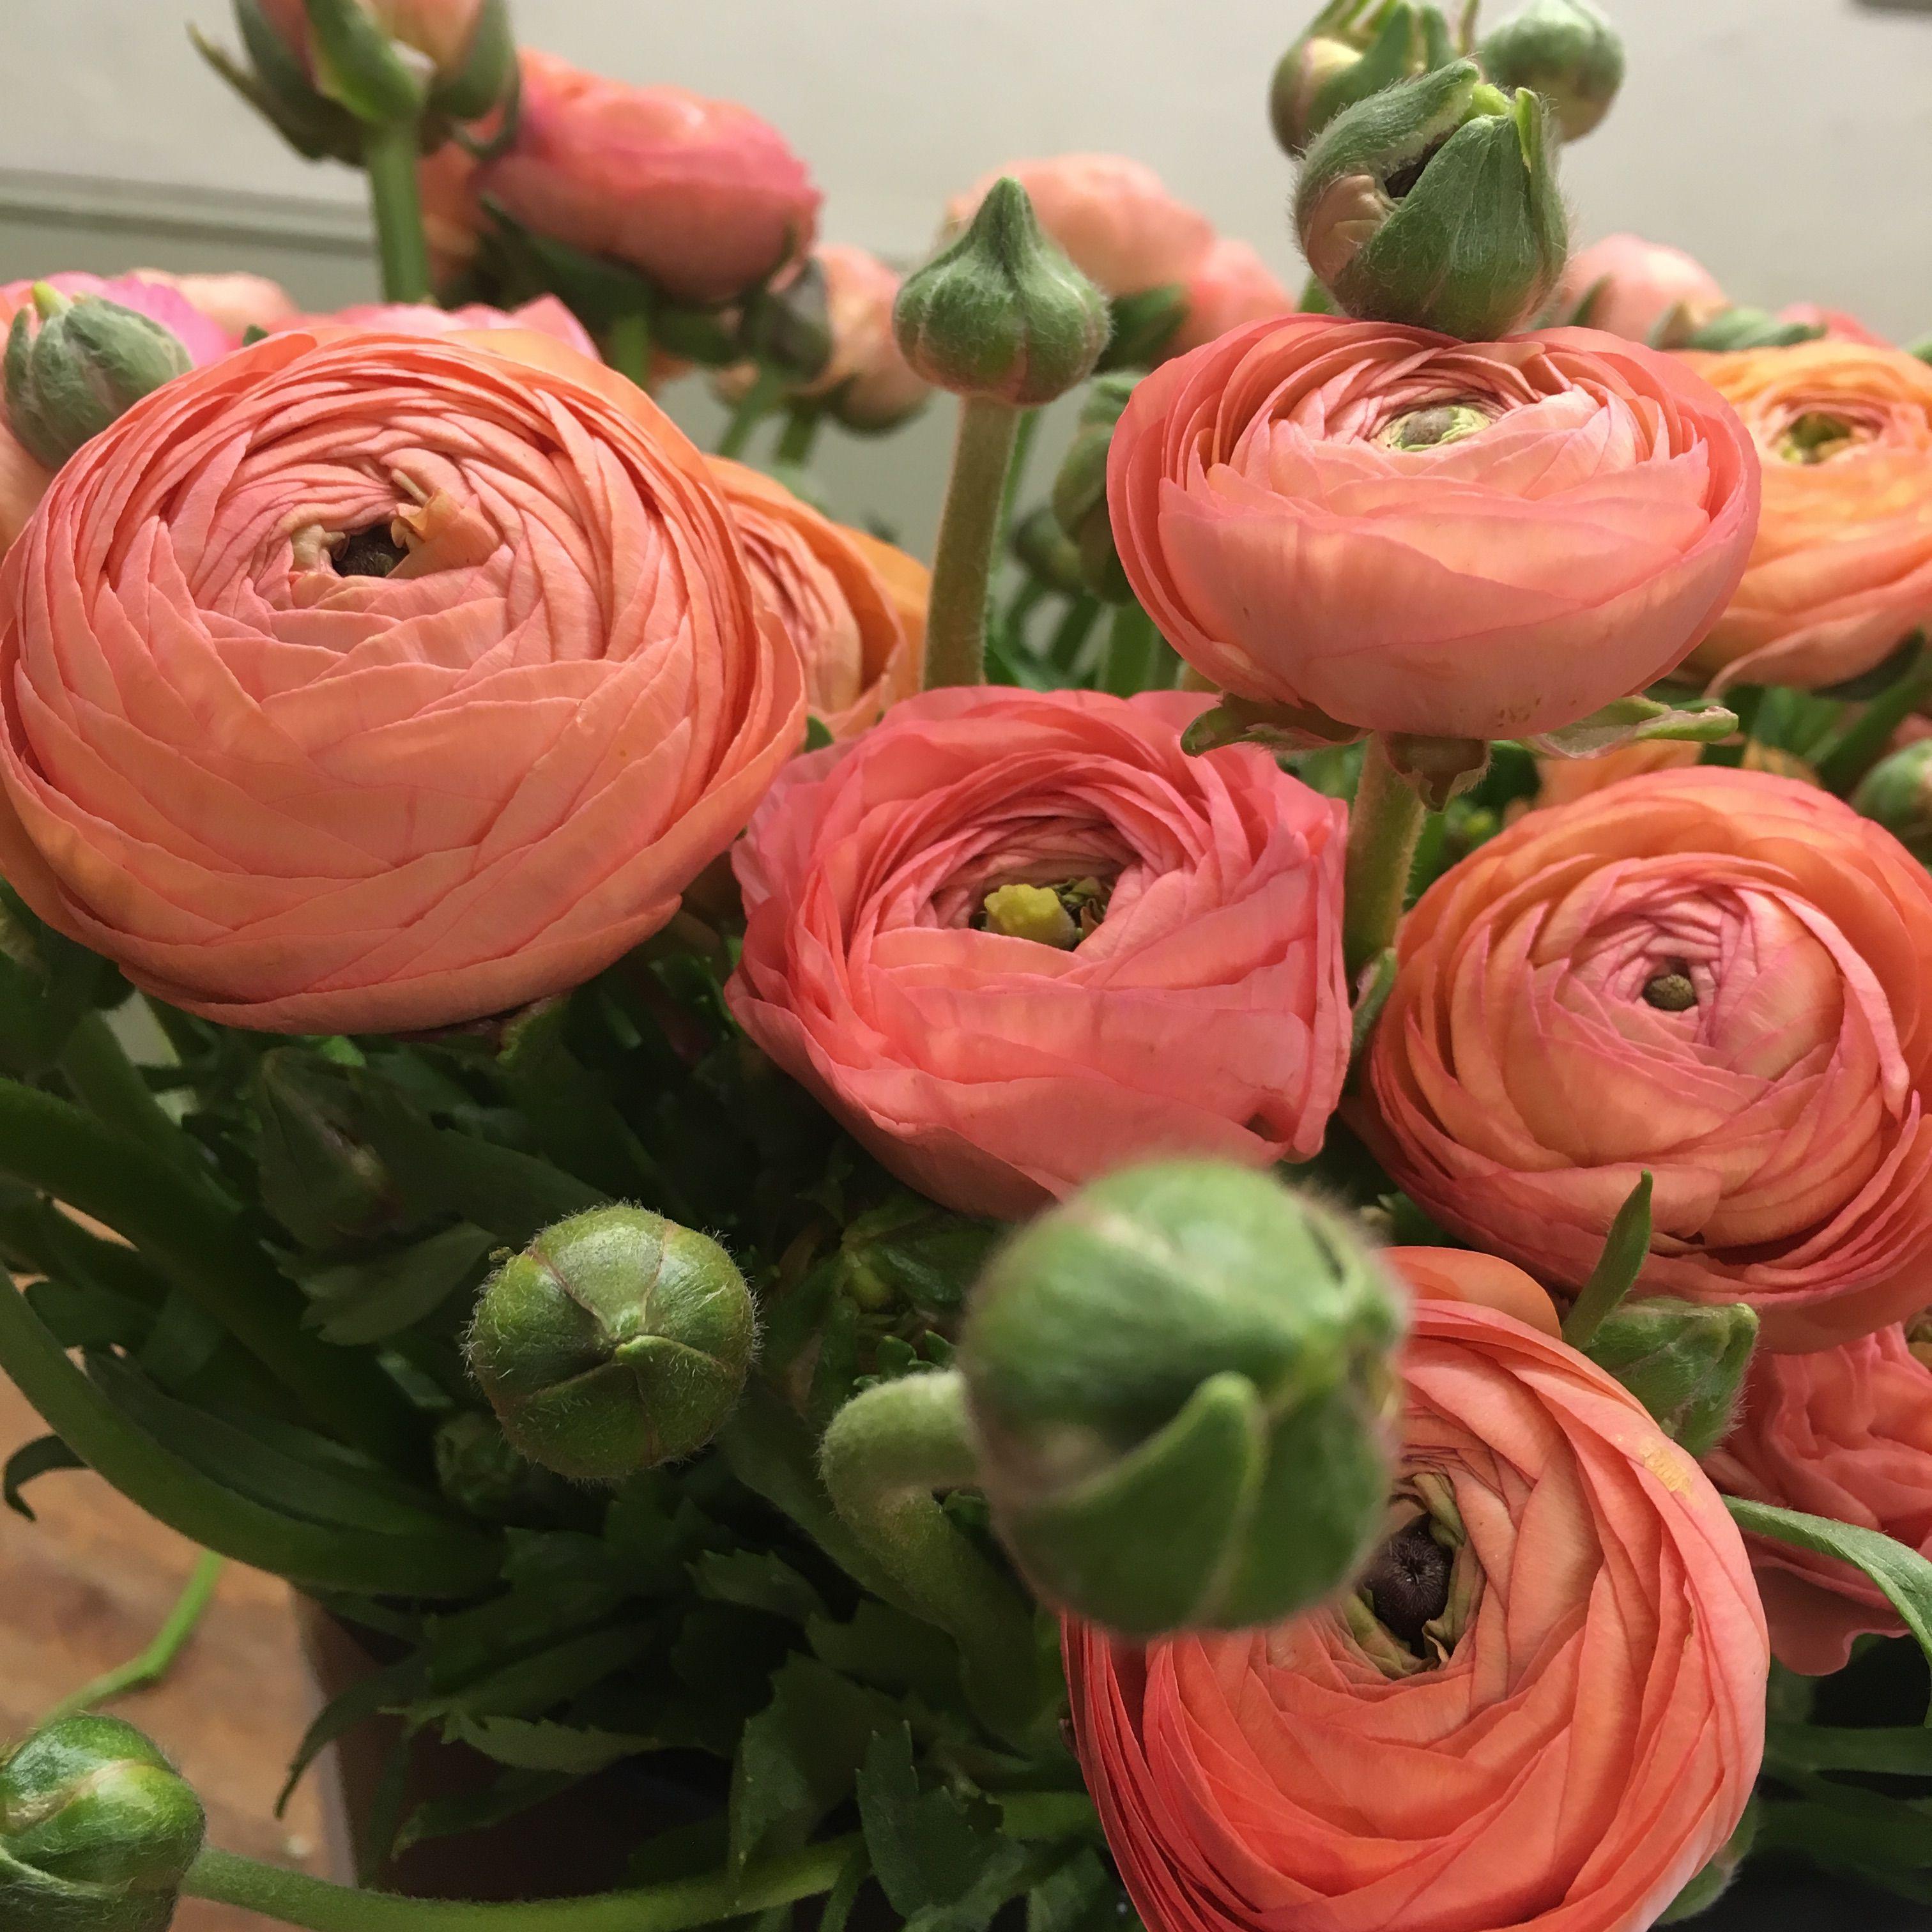 Наушники, цветы картинки ранункулюс английские